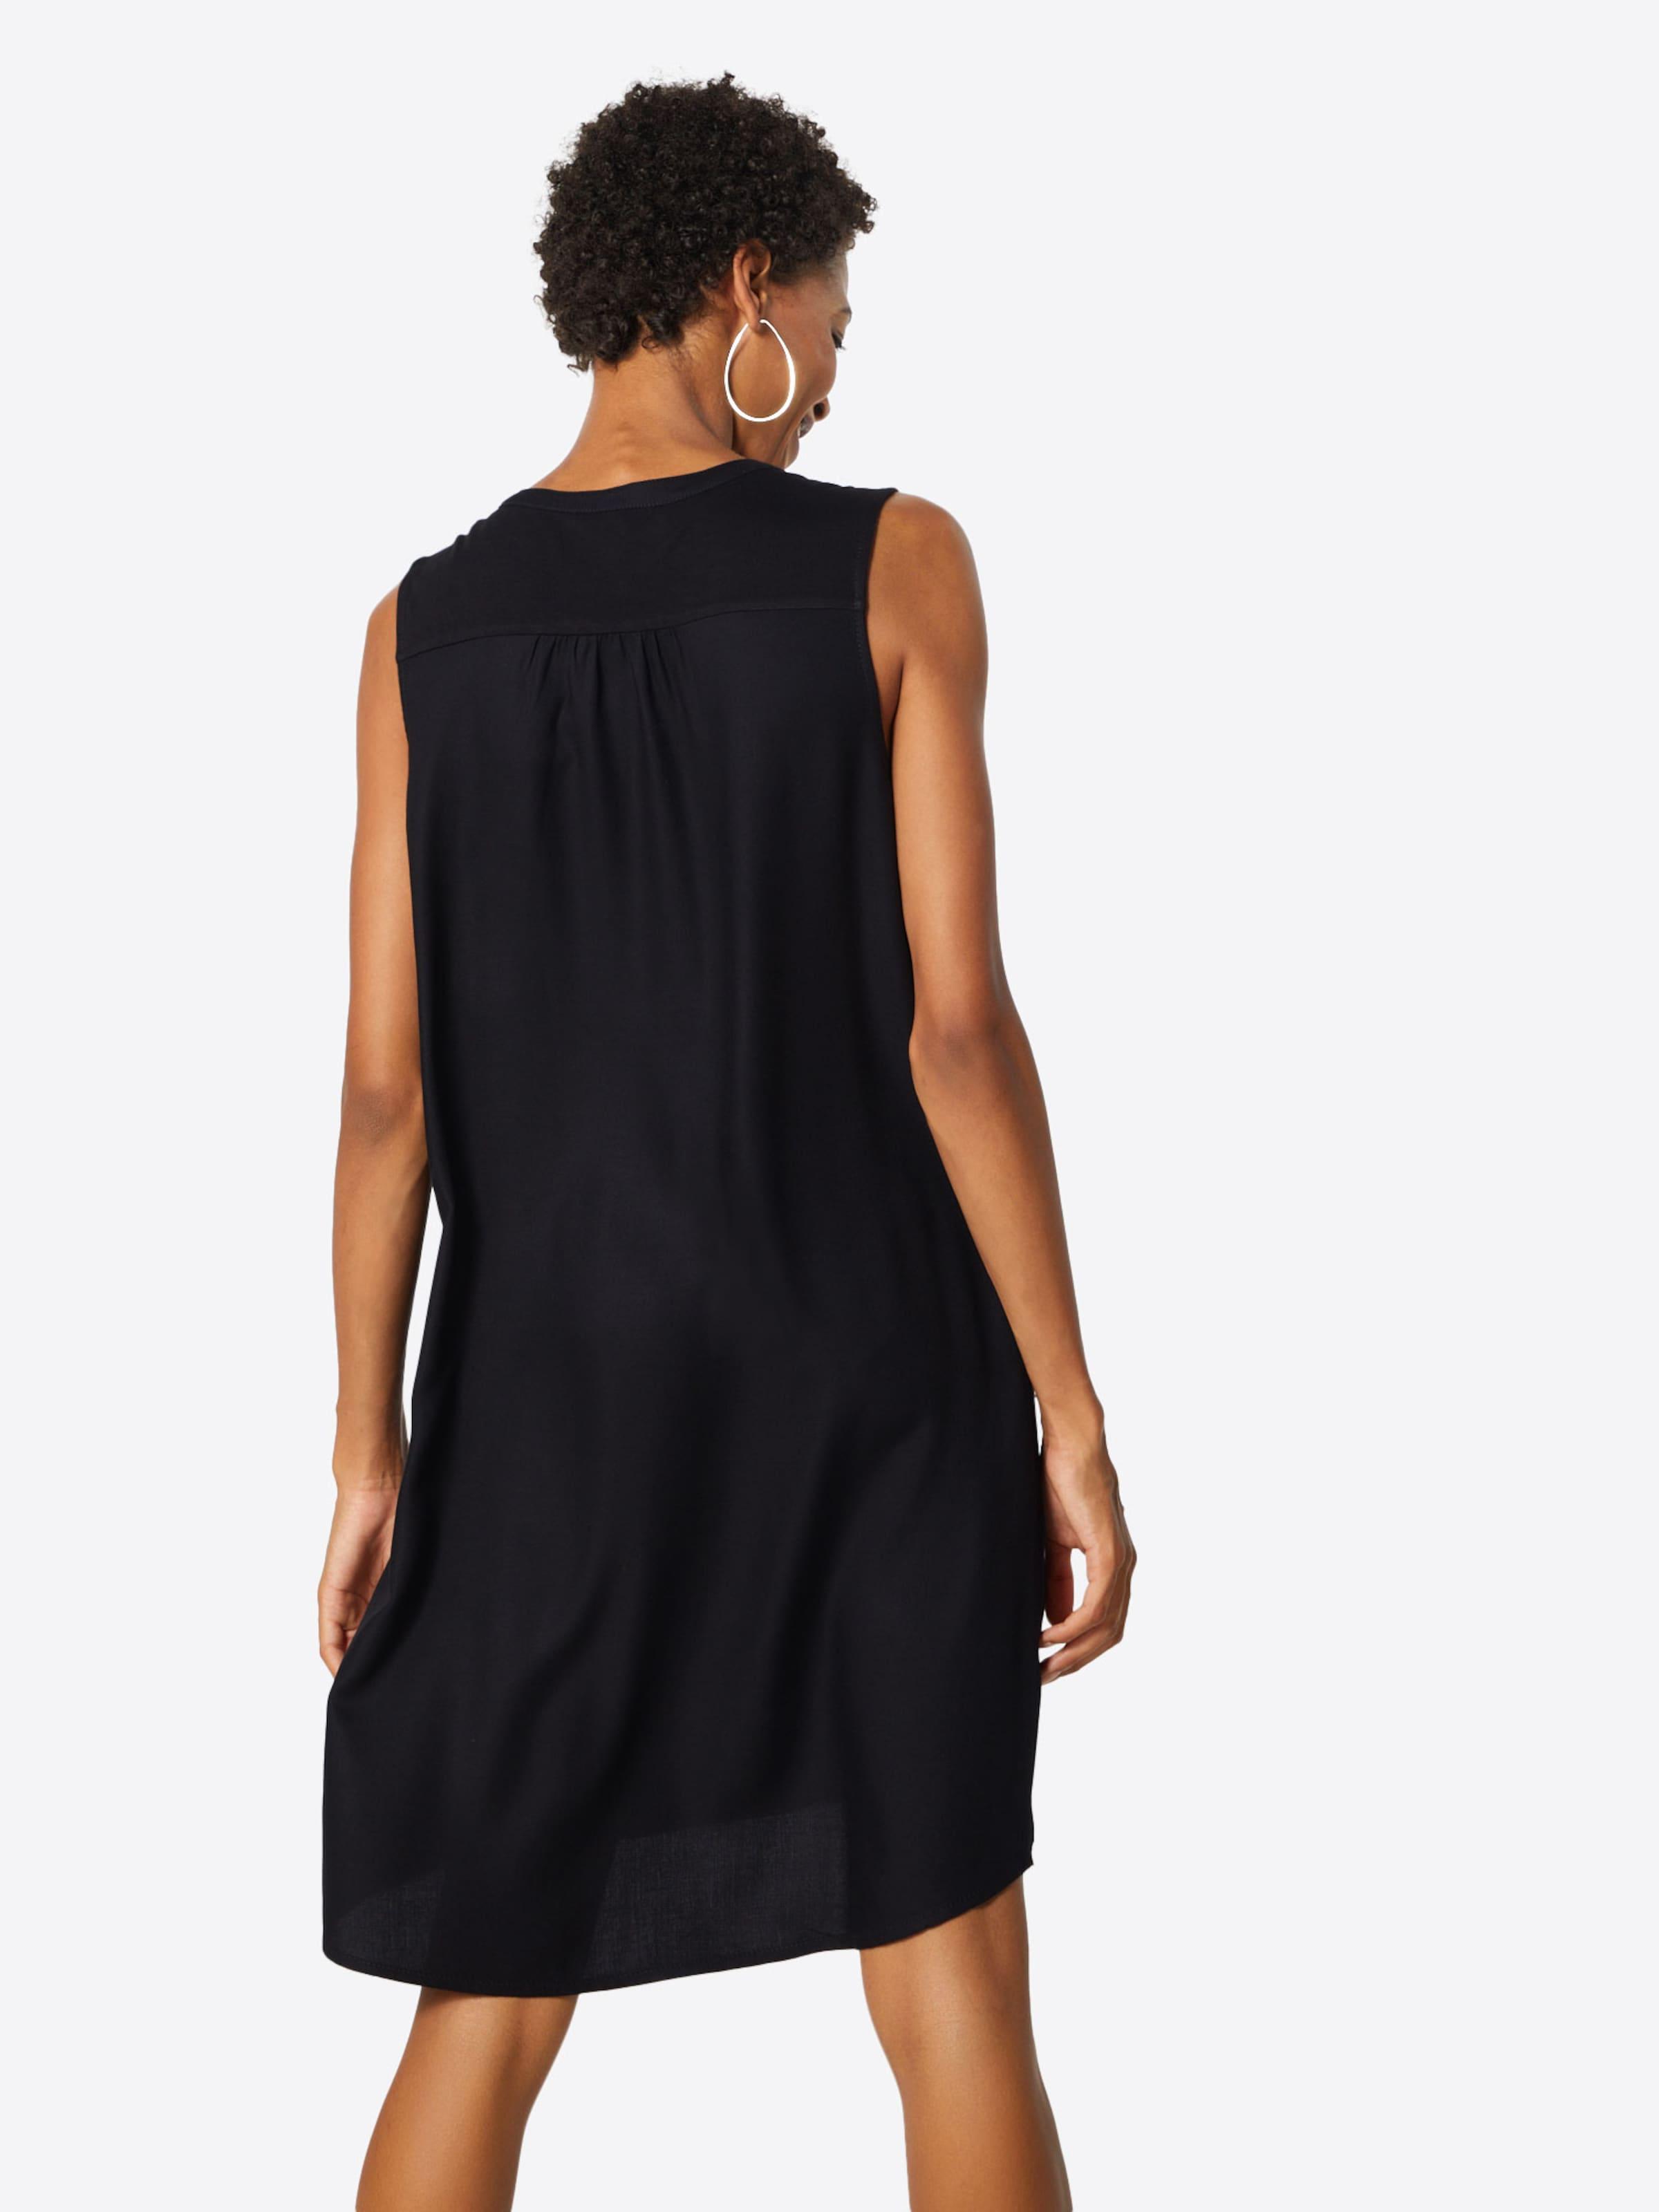 Designed Kleid Q Schwarz s By In SUMqzVp